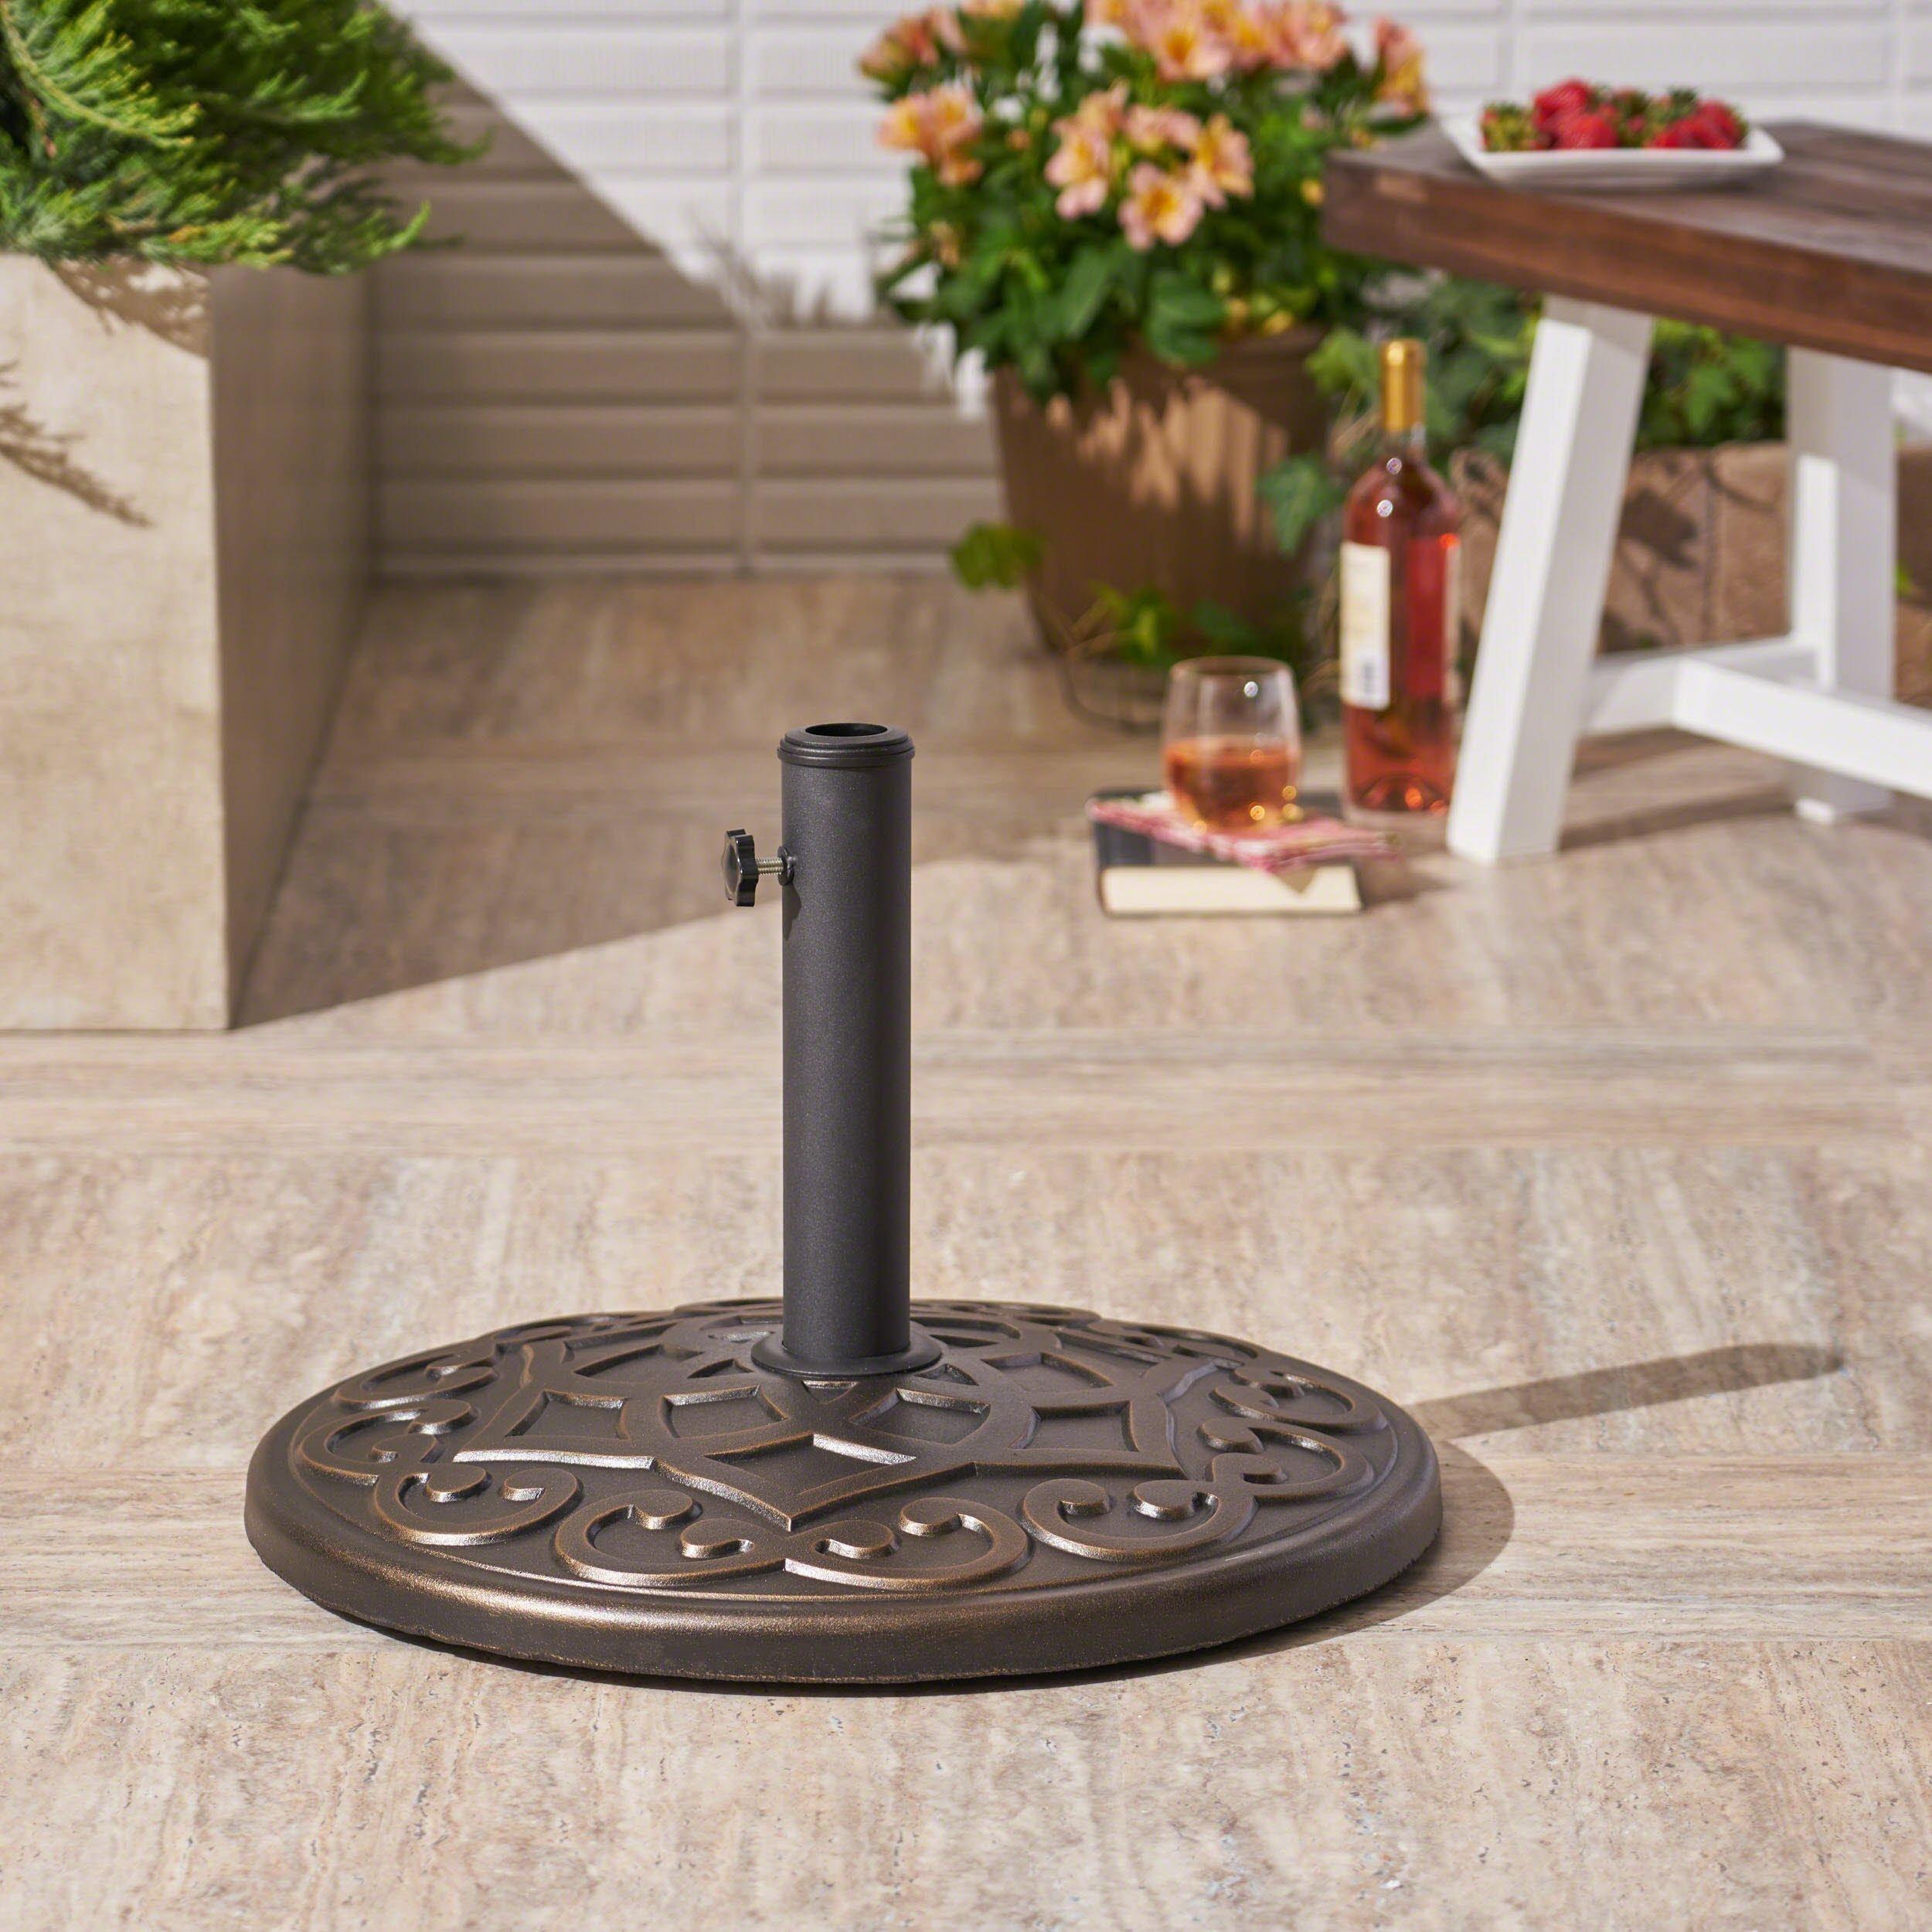 Great Deal Furniture Estelle   Outdoor Concrete Circular Umbrella Base   57LBS   in Hammered Dark Copper